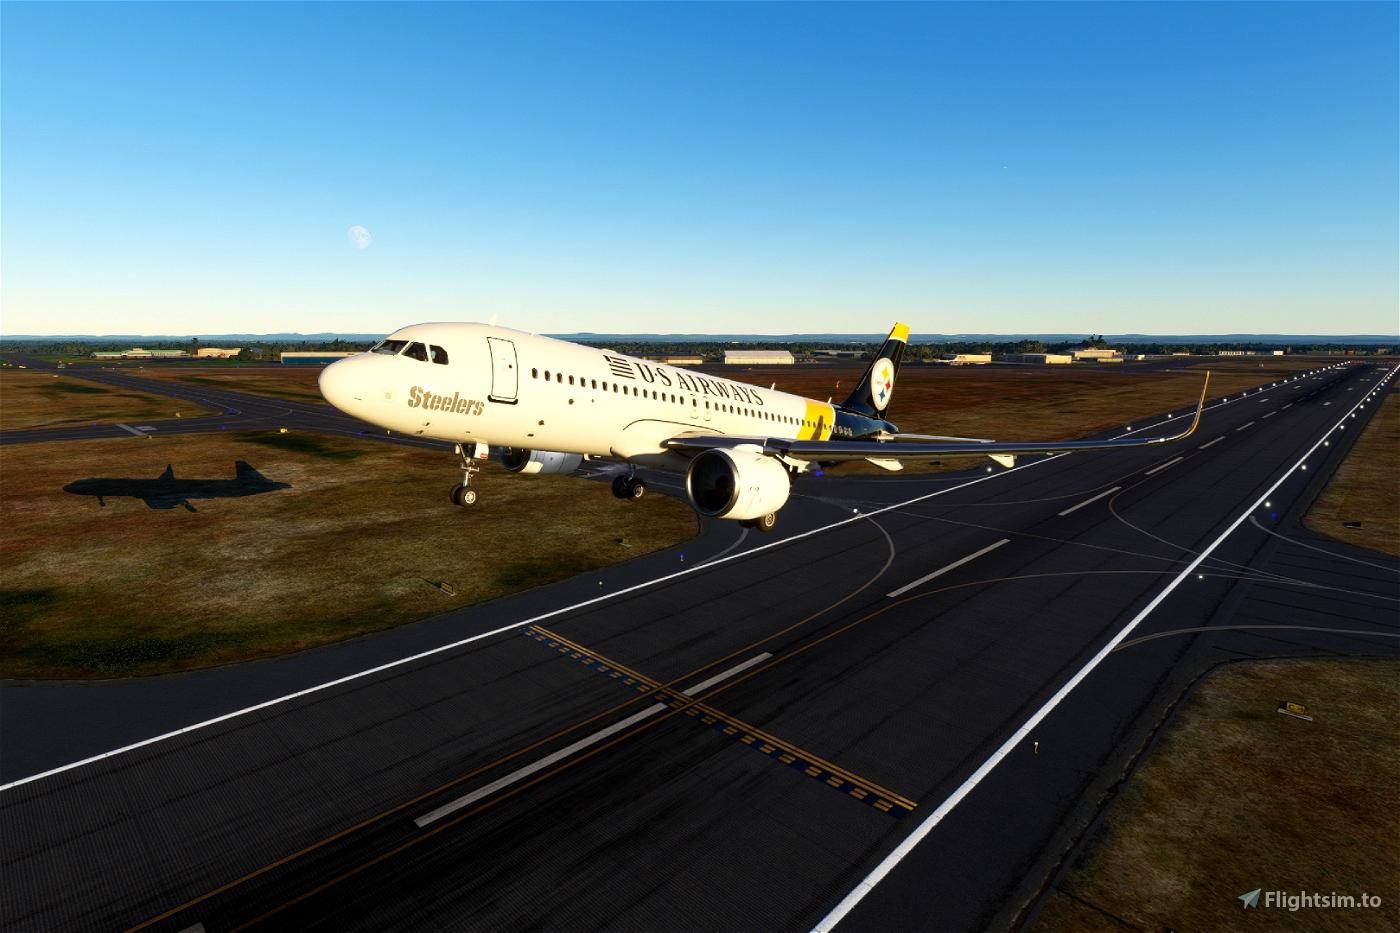 Pittsburgh Steelers Flight Simulator 2020